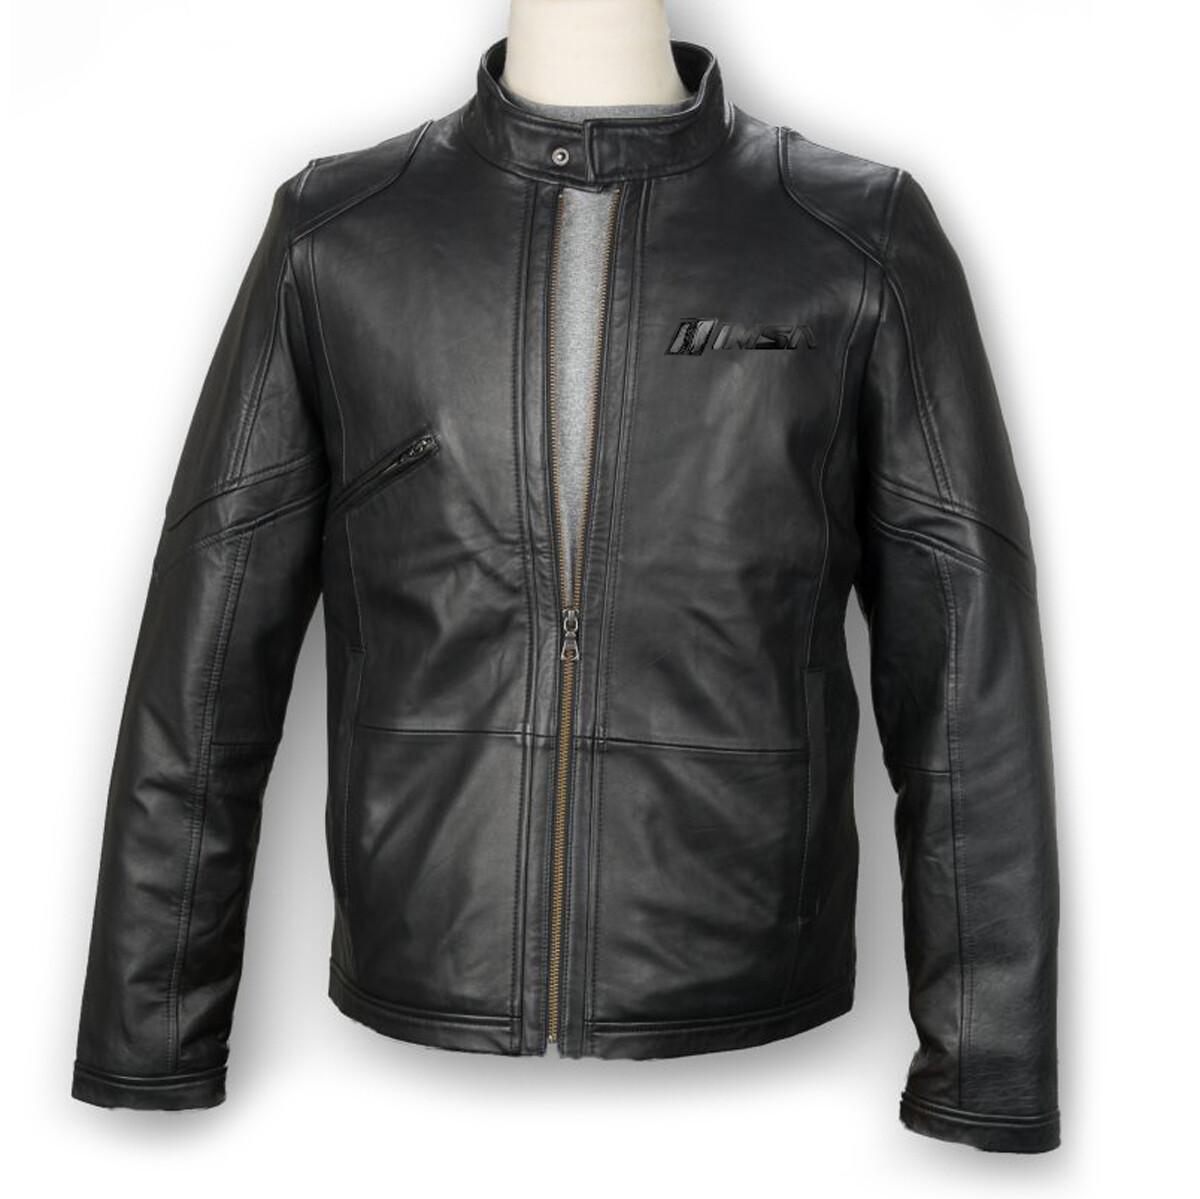 IMSA Lamb Leather Jacket